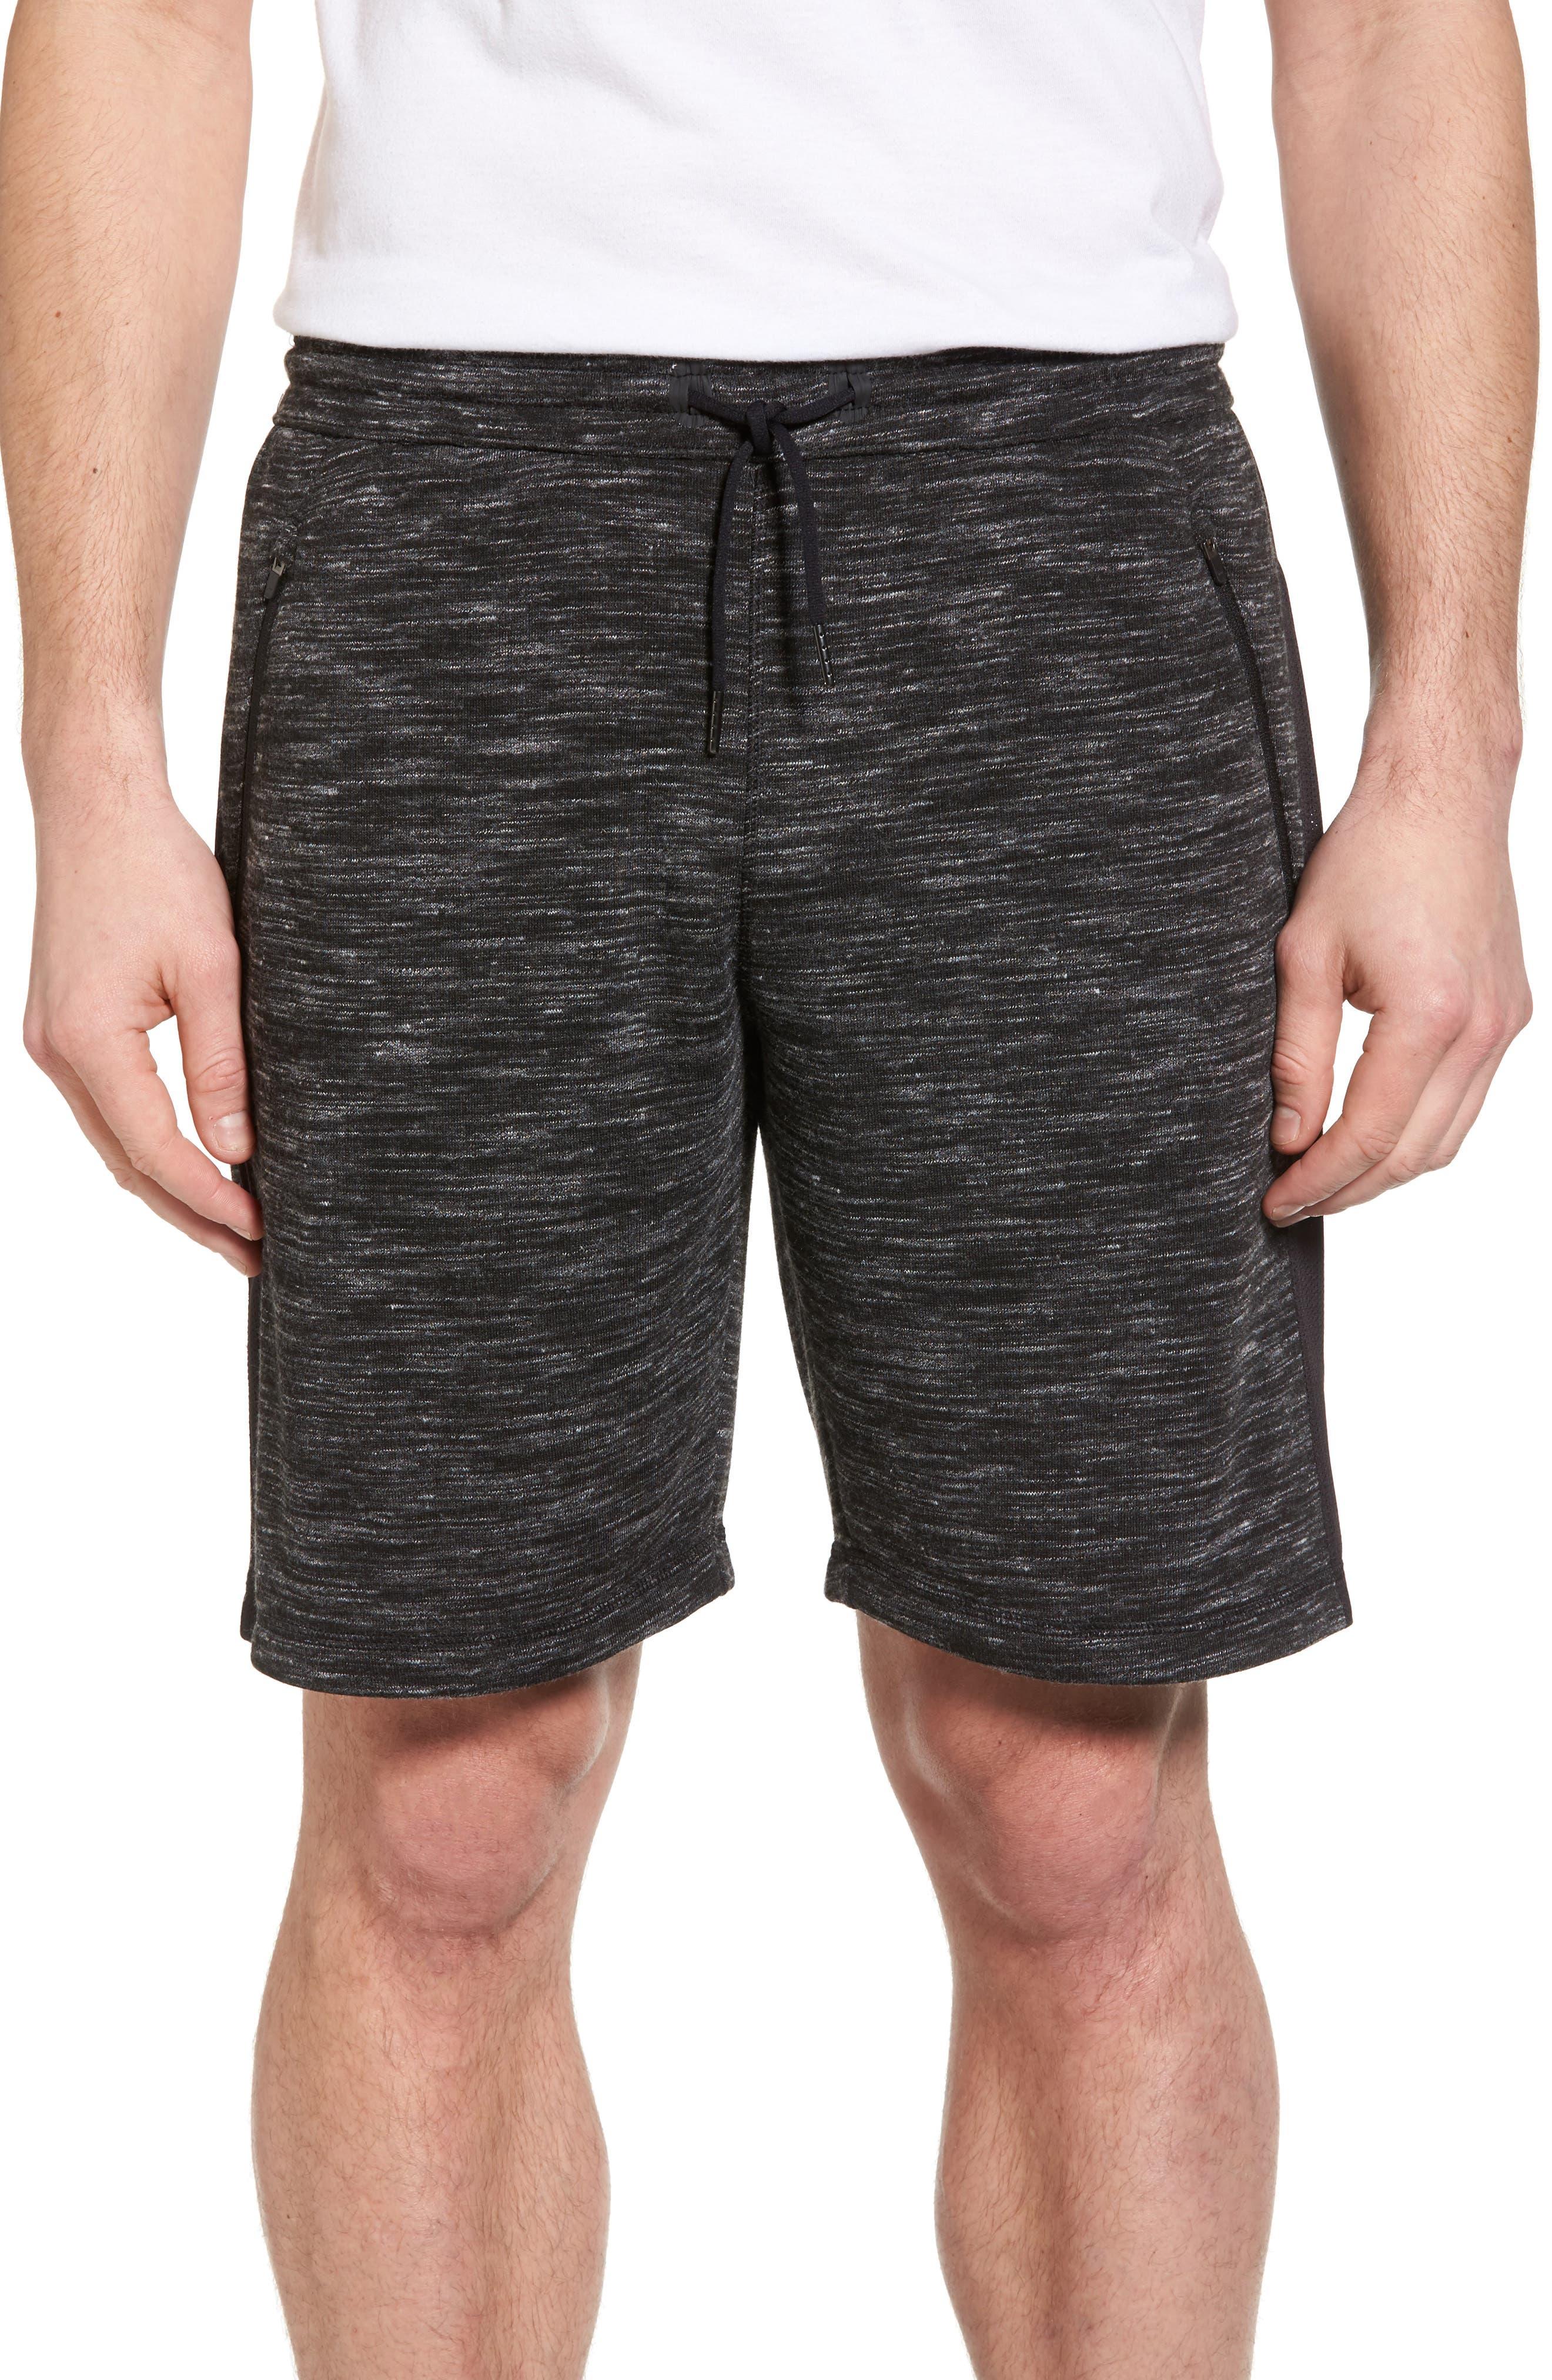 Neptune Terrycloth Shorts,                             Main thumbnail 1, color,                             Black Oxide Melange